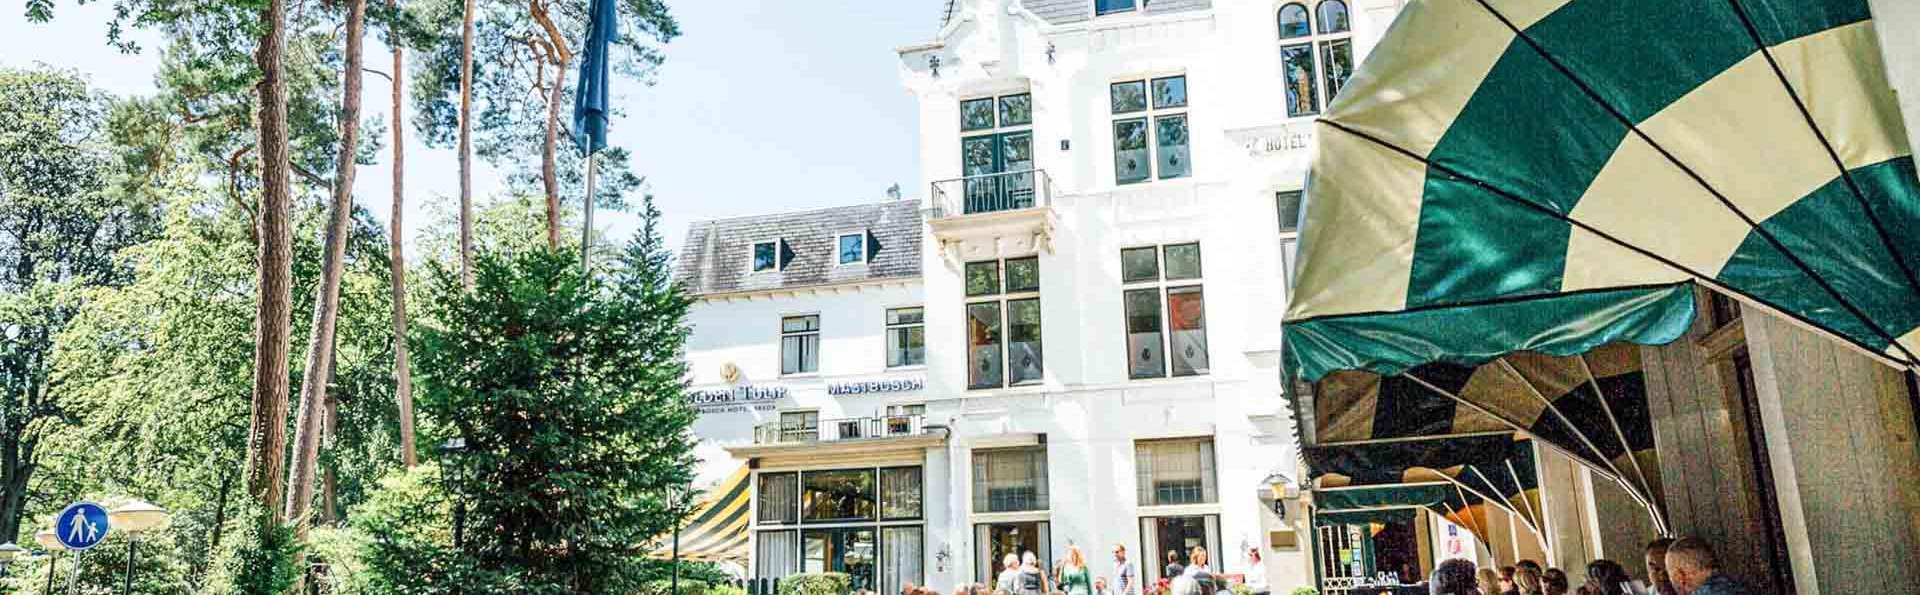 Hotel Mastbosch Breda - EDIT_Hotel_nieuw_01.jpg